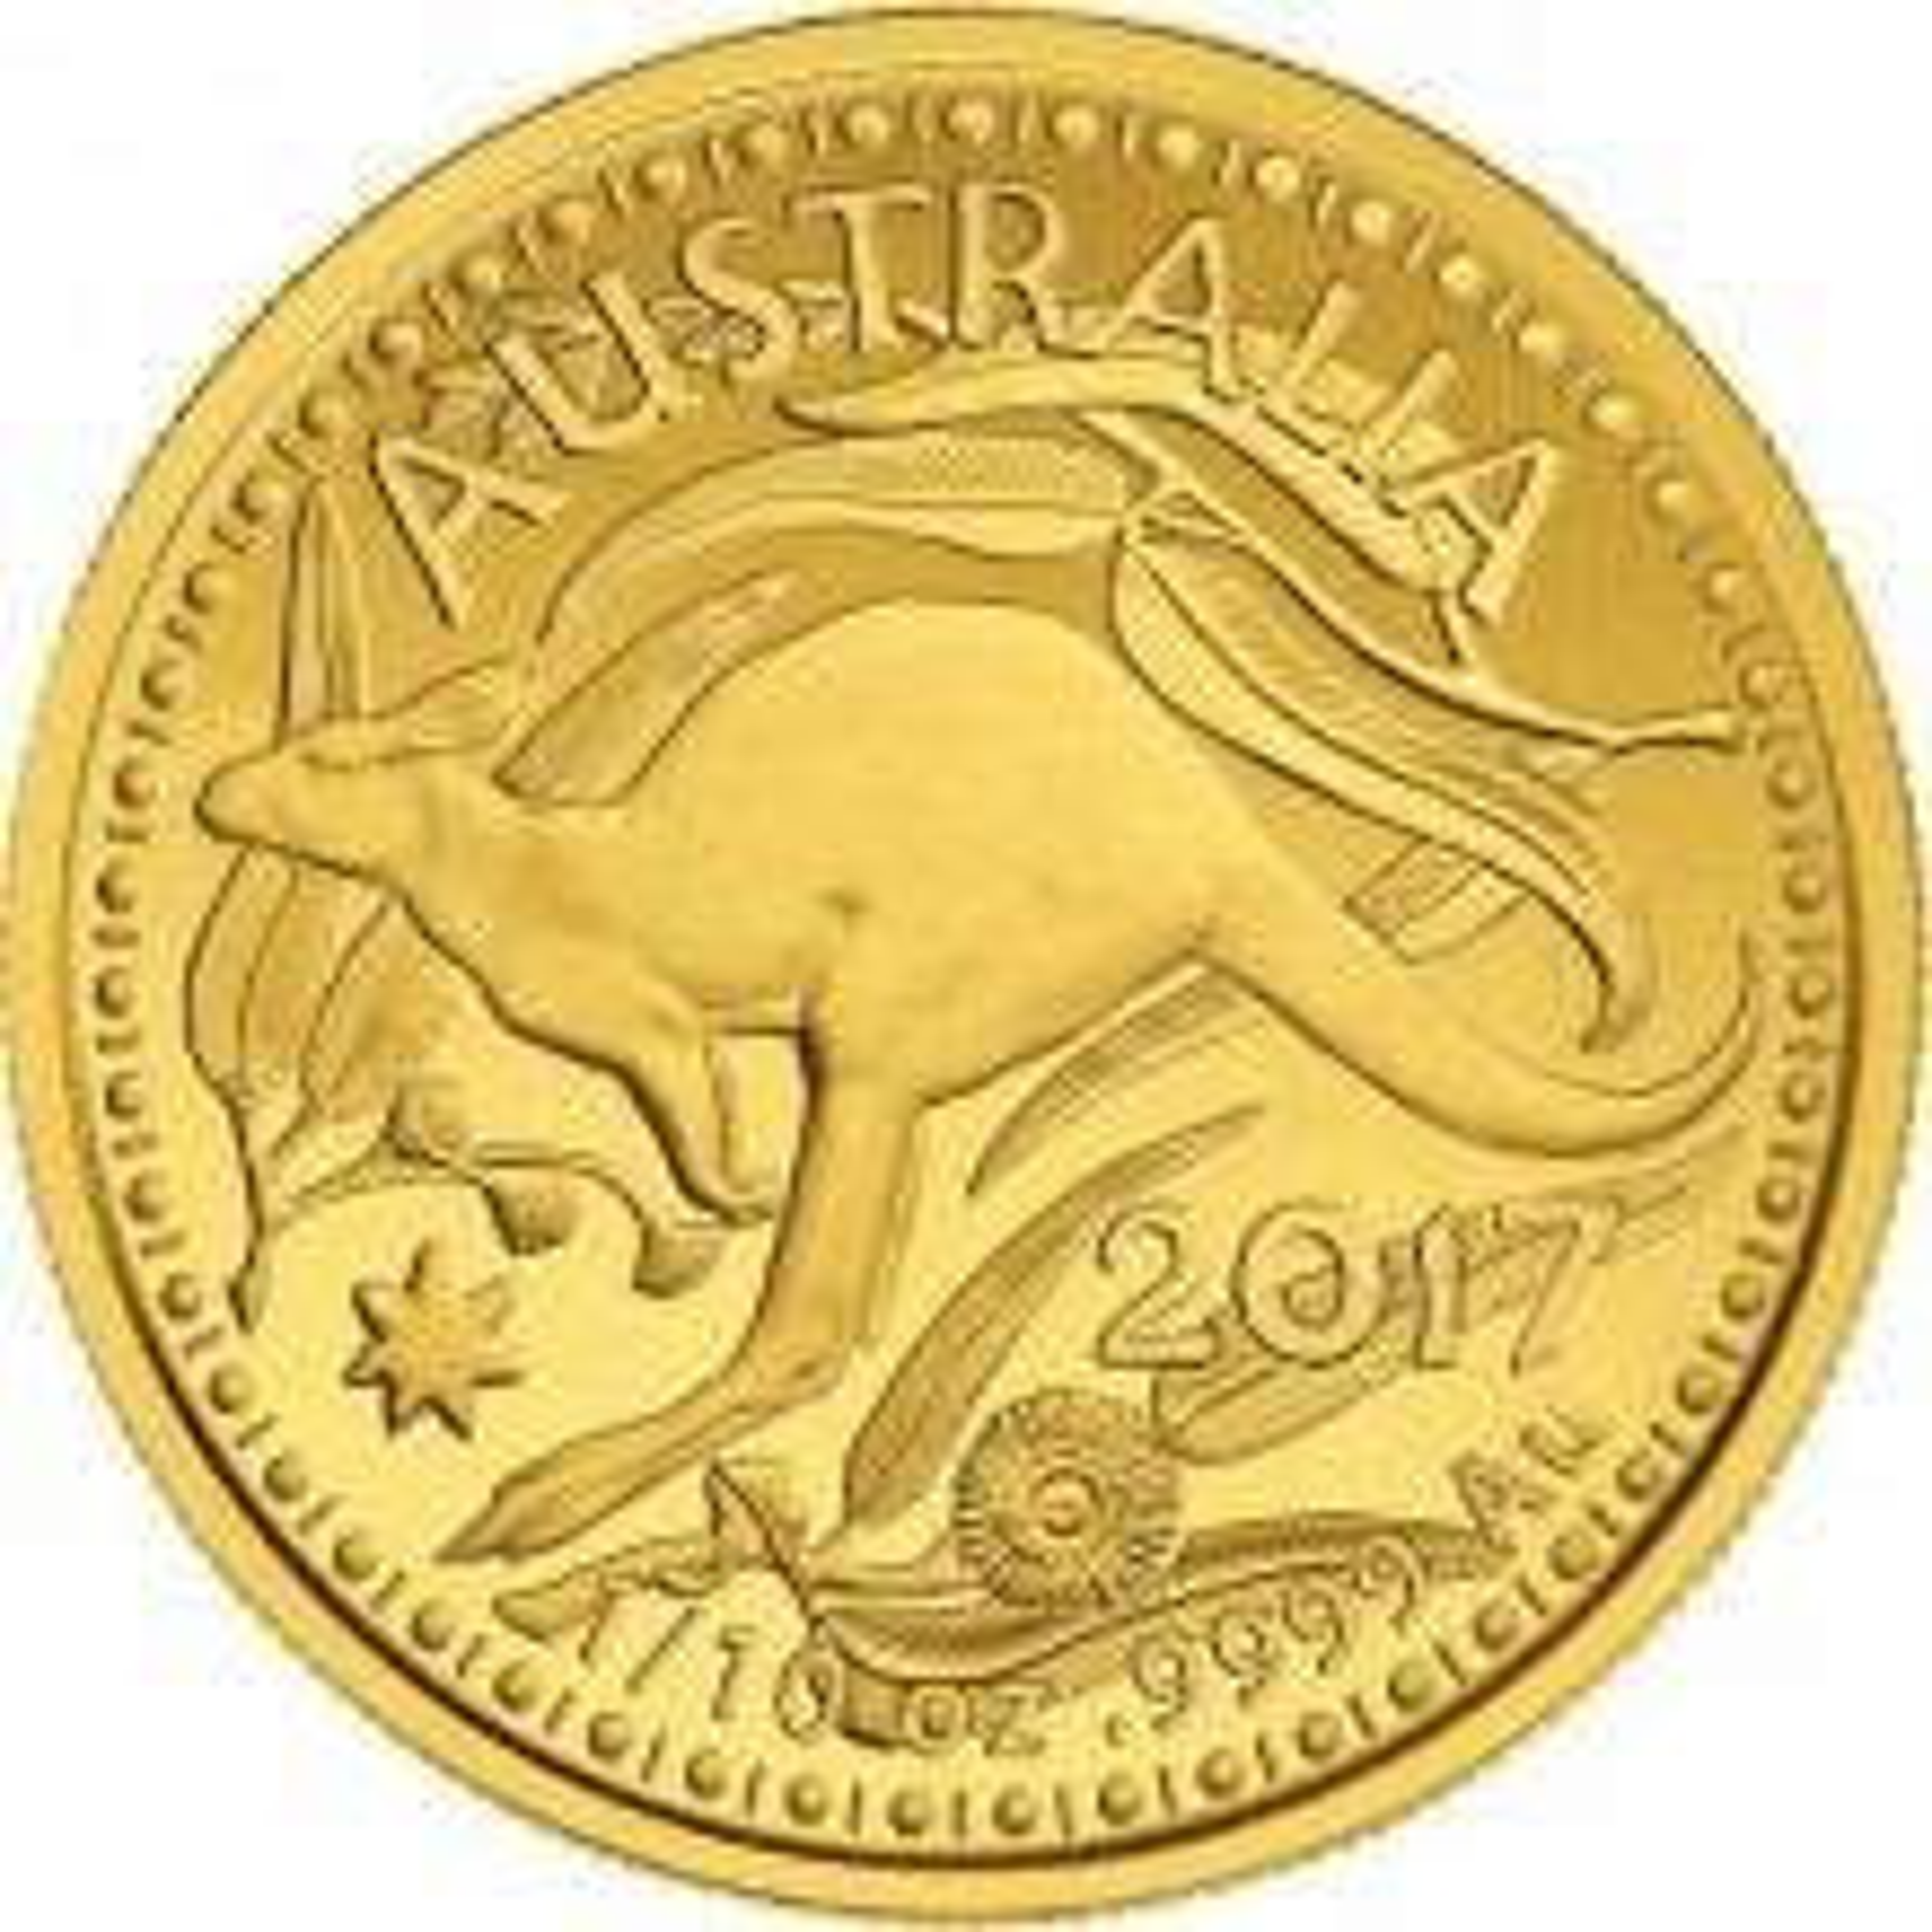 1 Troy ounce gouden munt Kangaroo 2017 Royal Australian Mint